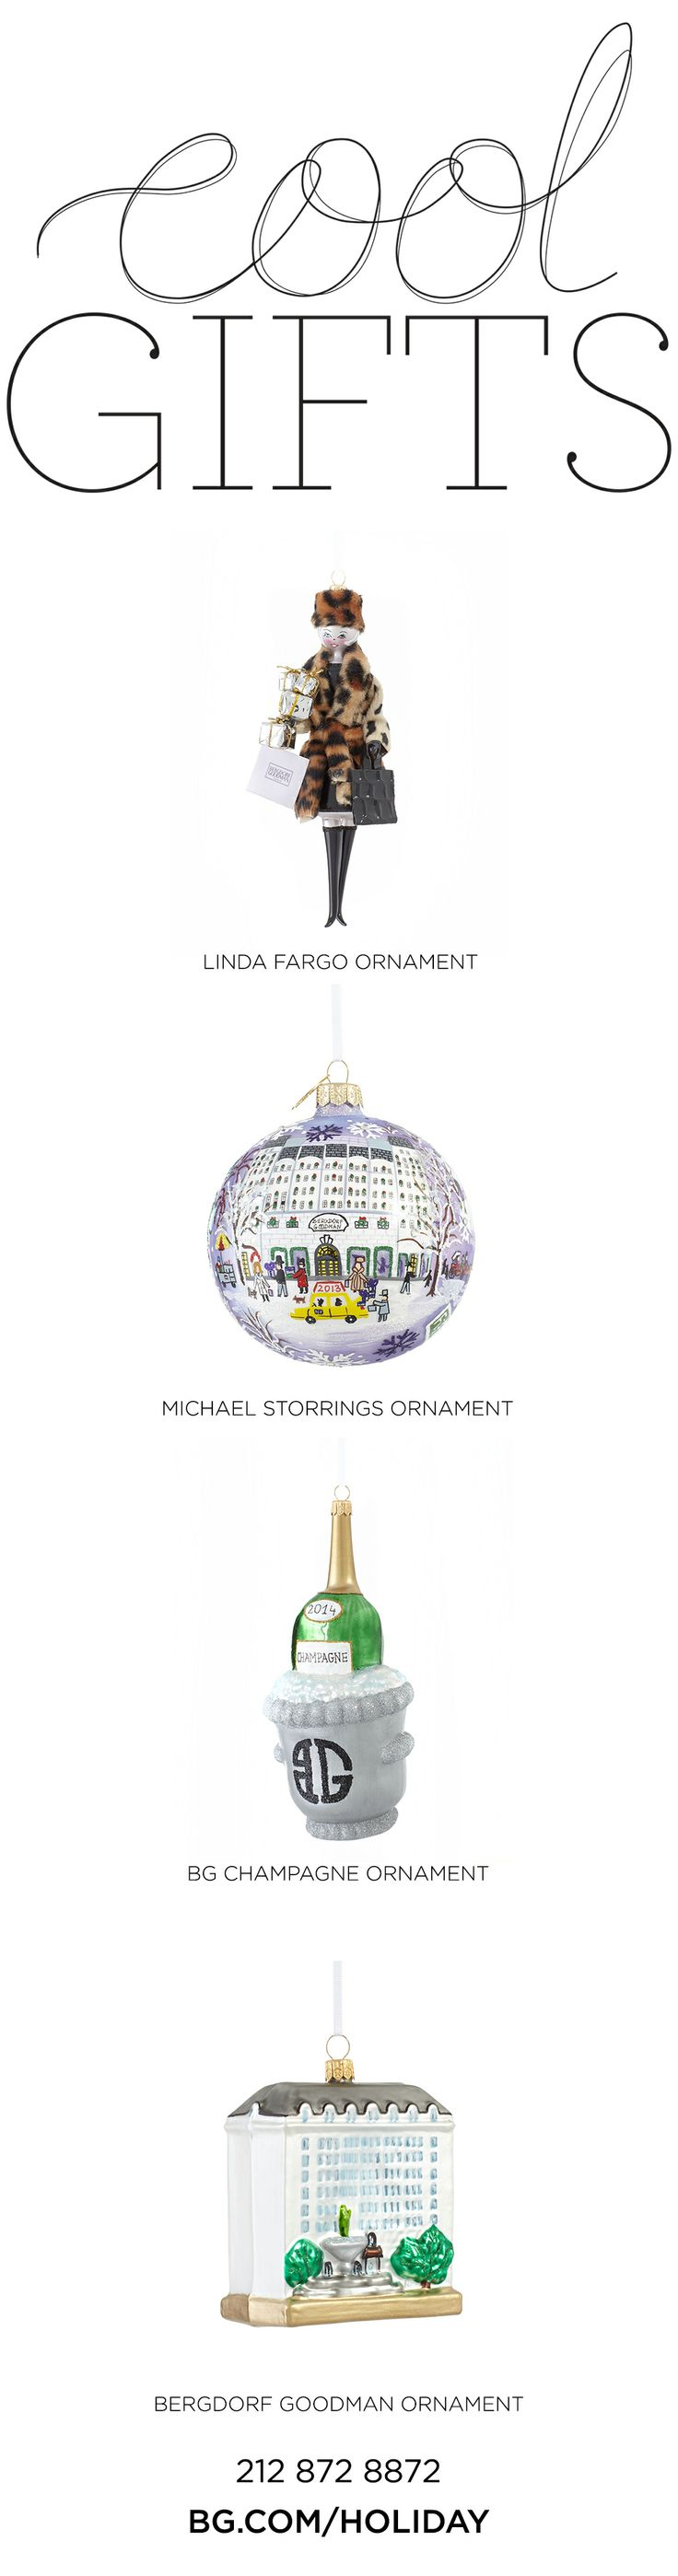 THE HOSTESS - Bergdorf Goodman ornaments. 212 872 8872